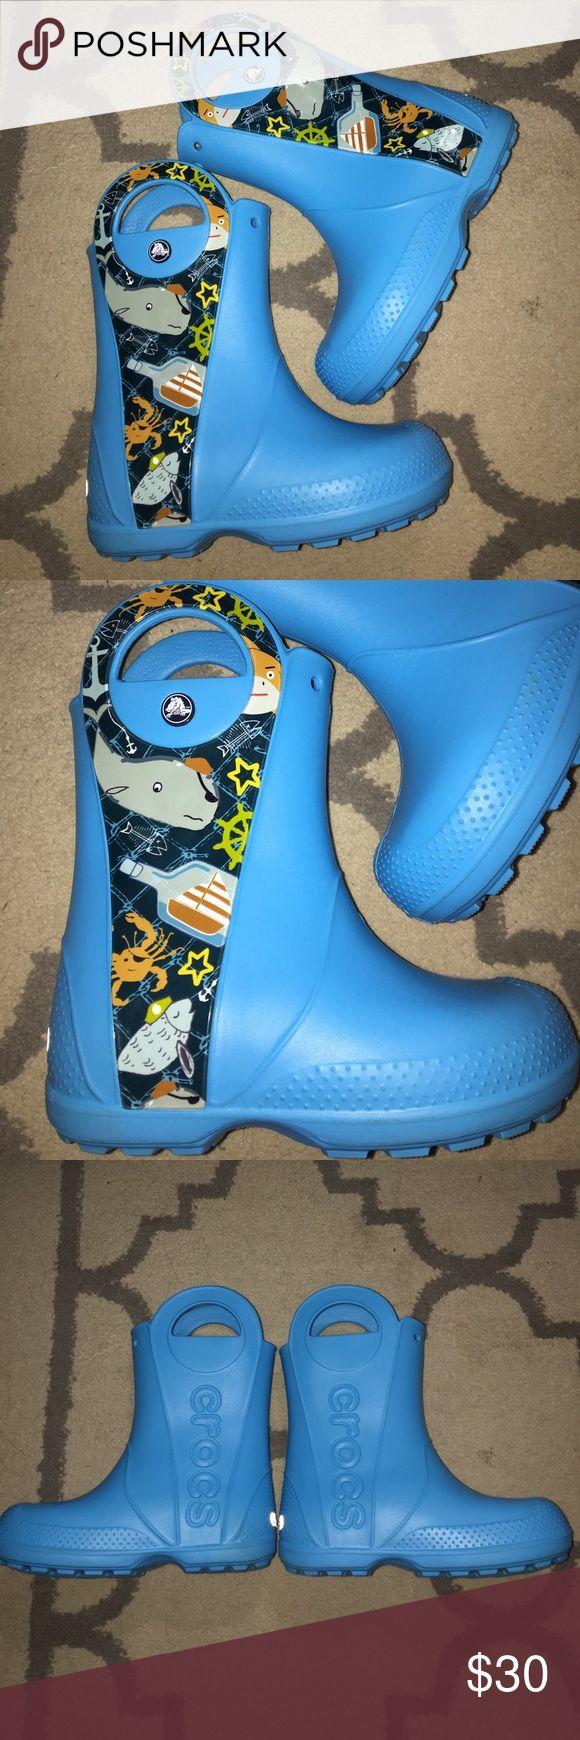 NWOT Handle It Sea life Sz 13 Crocs Rain Boots Super cute NWOT CROCS Toddler rain boots - Sz 13, the color is blue with nautical picture on side of both boot! CROCS Shoes Rain & Snow Boots